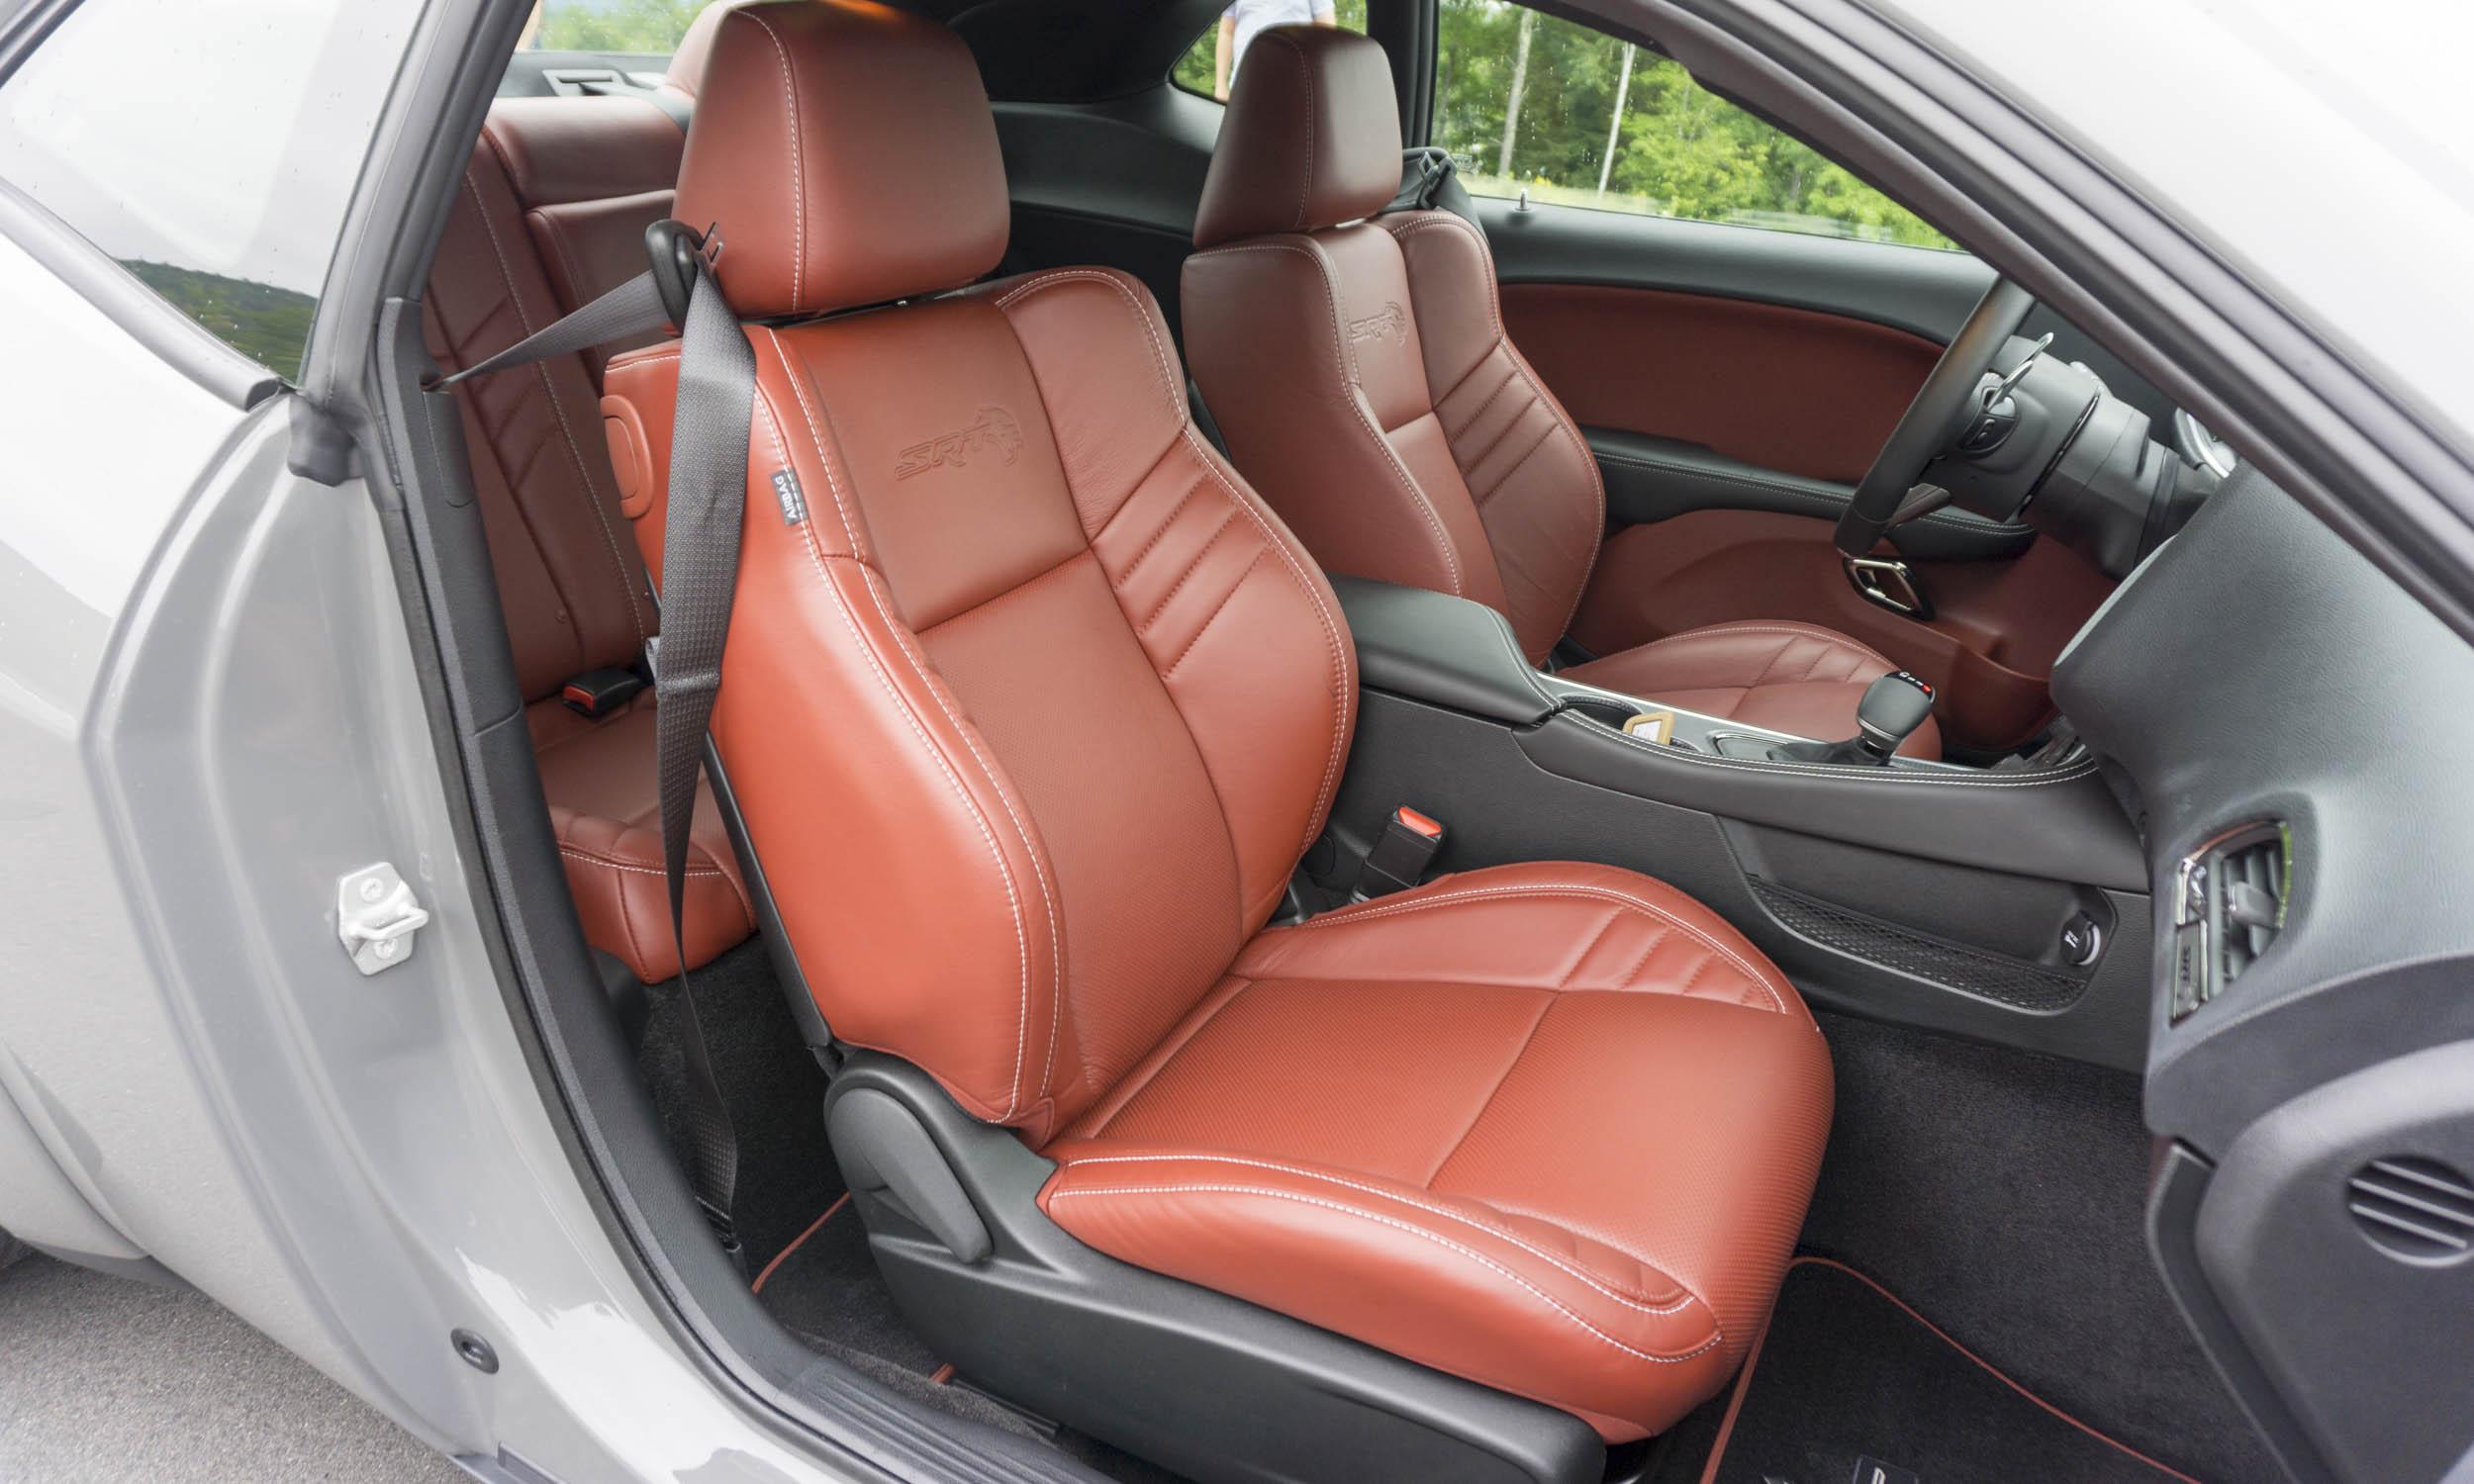 2019 Dodge Challenger Hellcat Redeye First Drive Review Autonxt